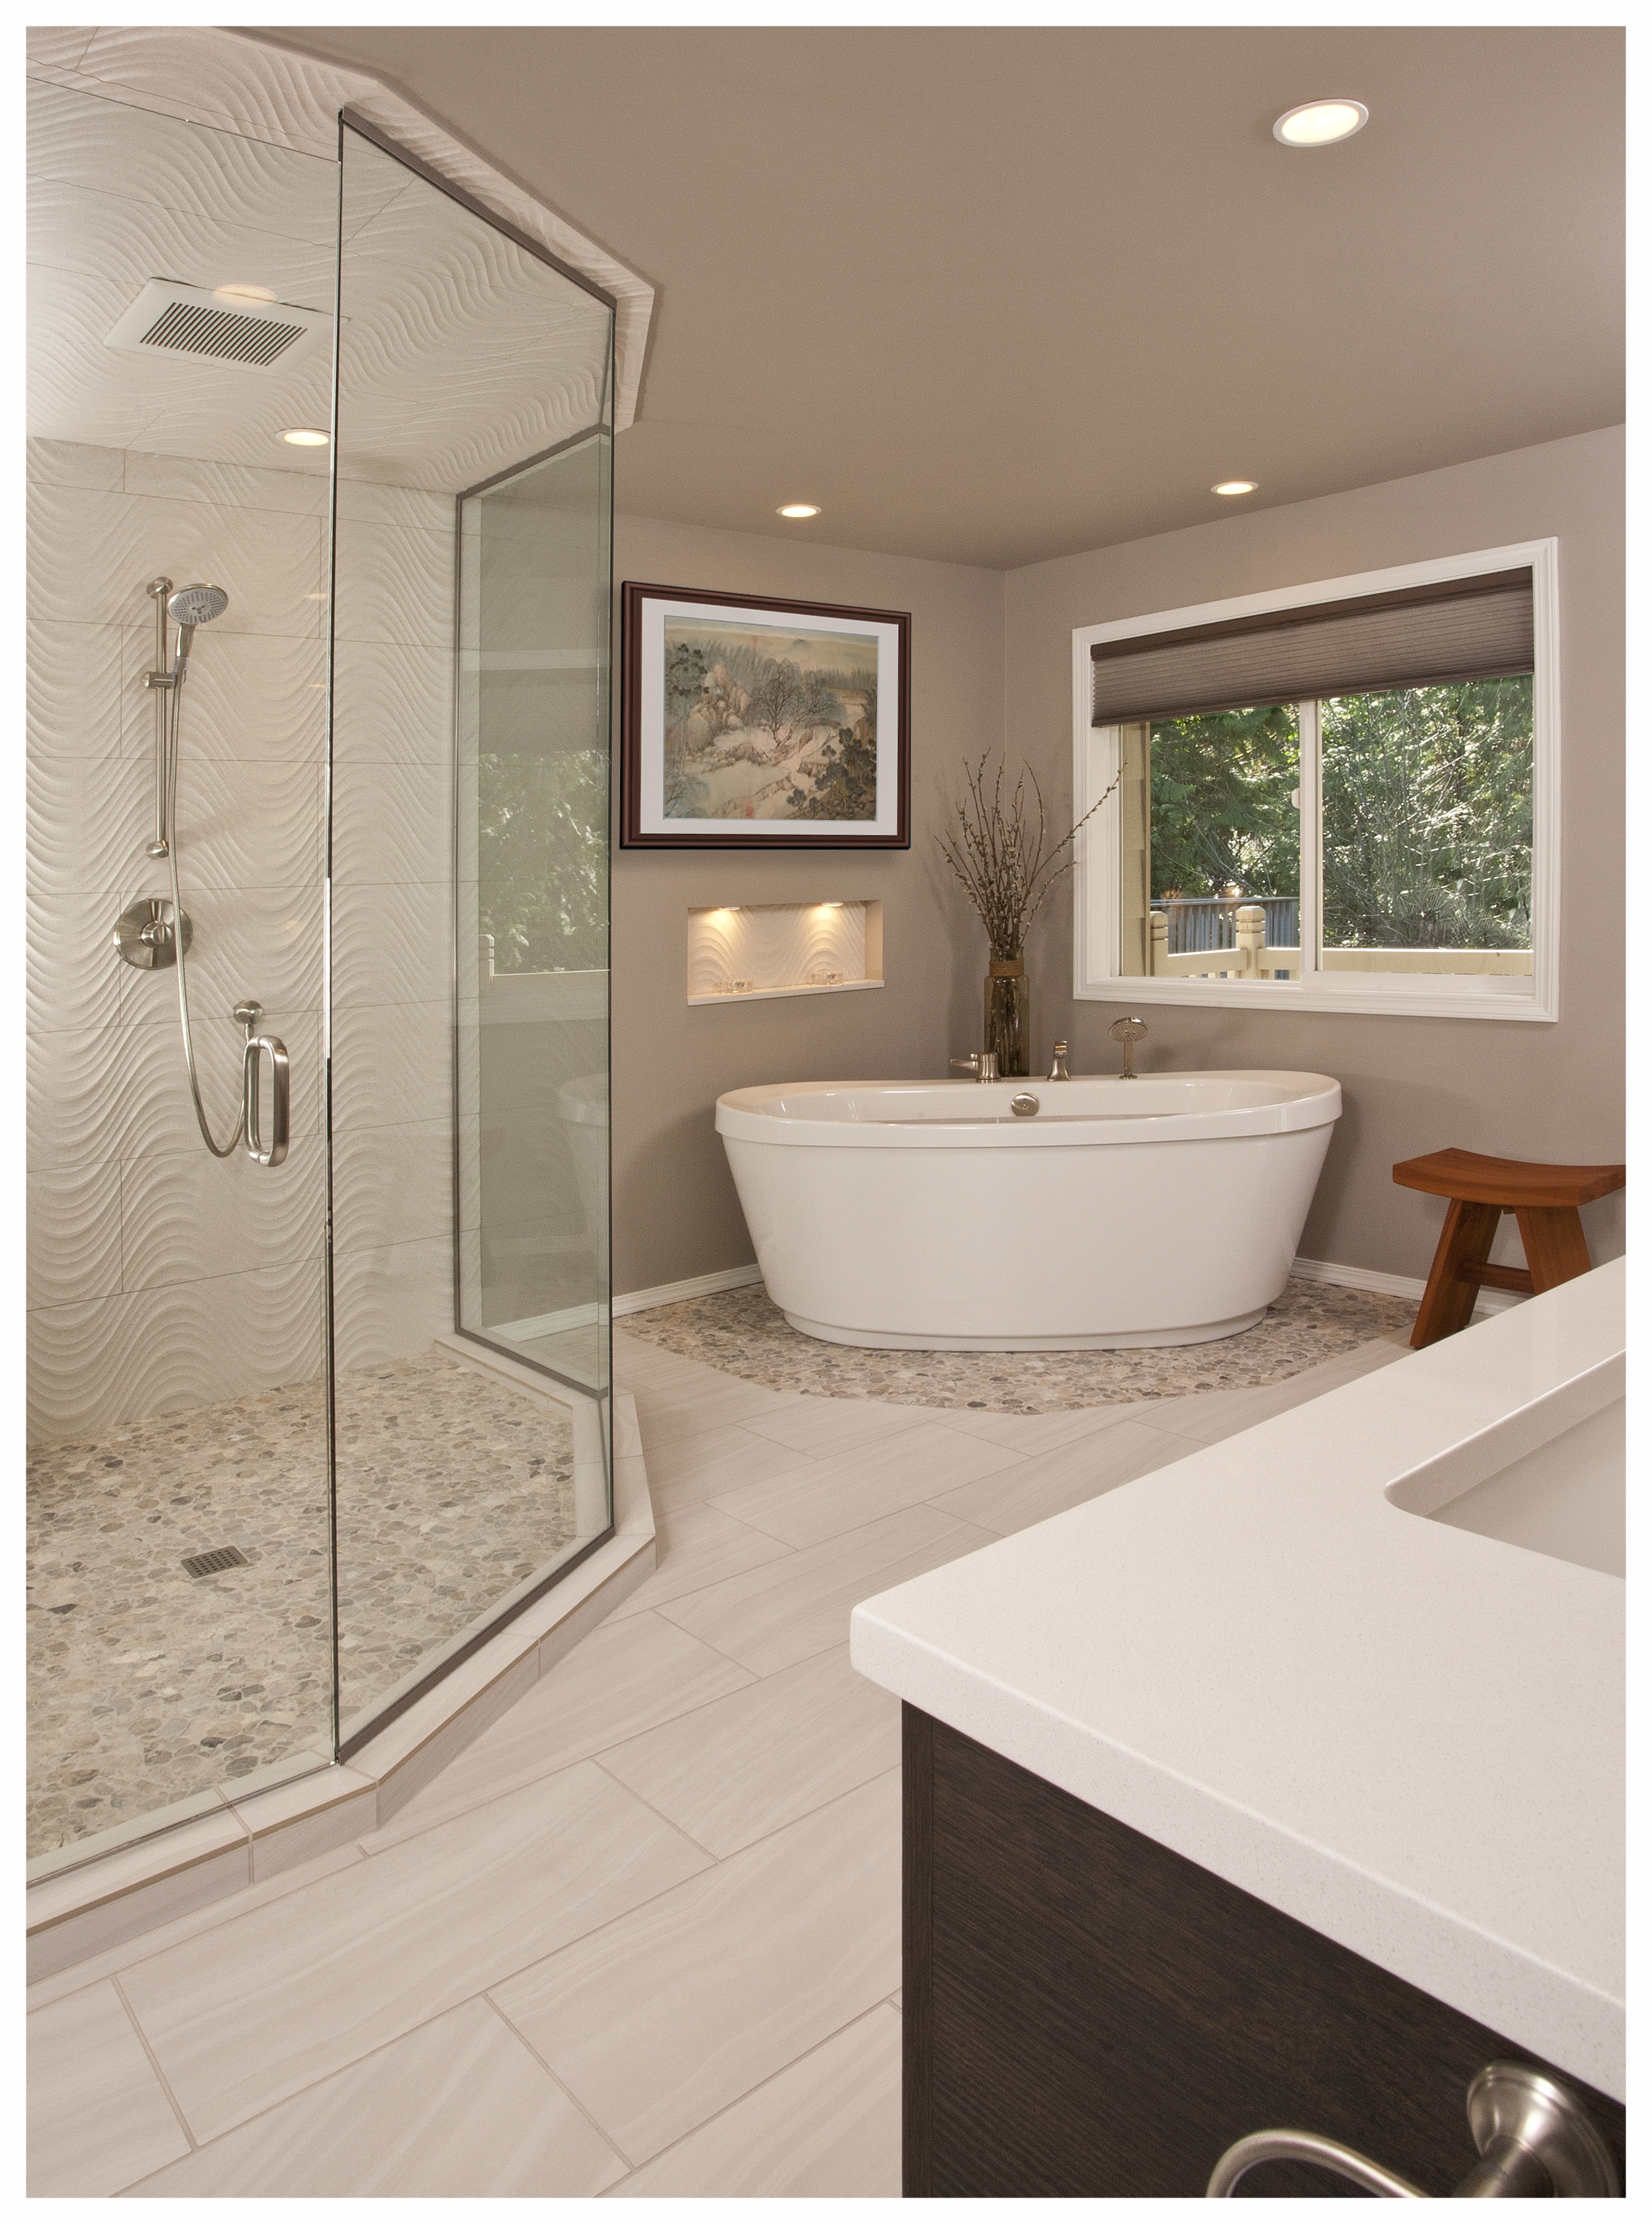 Bellevue Clyde Hill Contemporary Master Bath 5.jpg